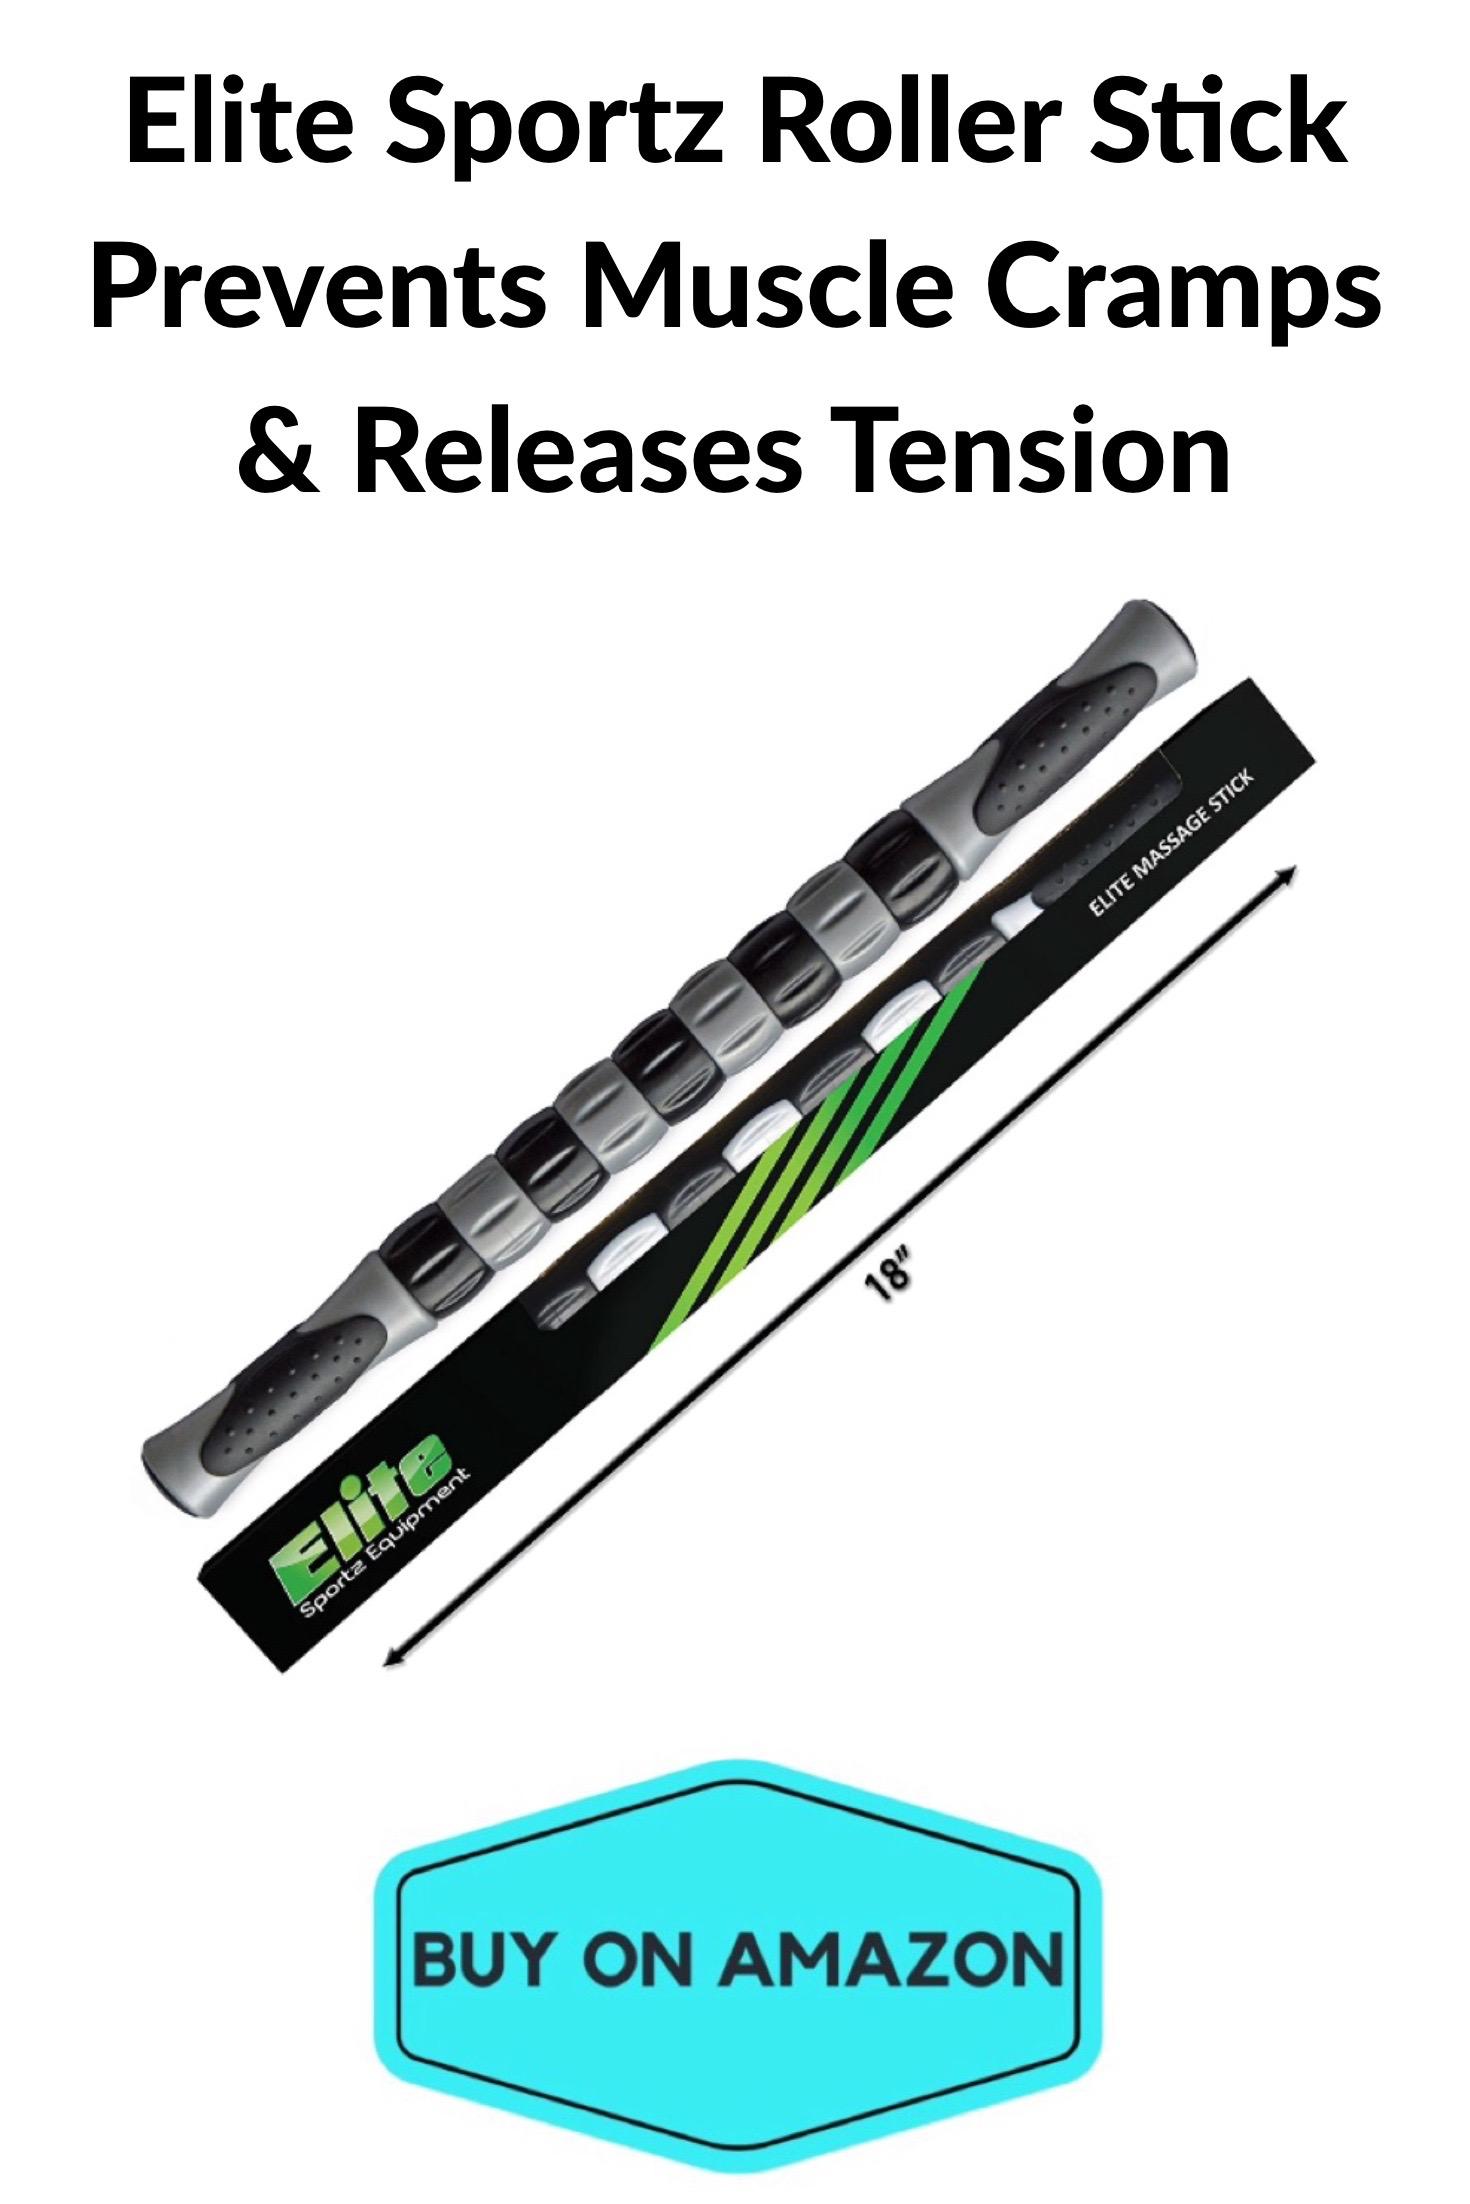 Elite Sportz Roller Stick For Muscle Cramps/Tension